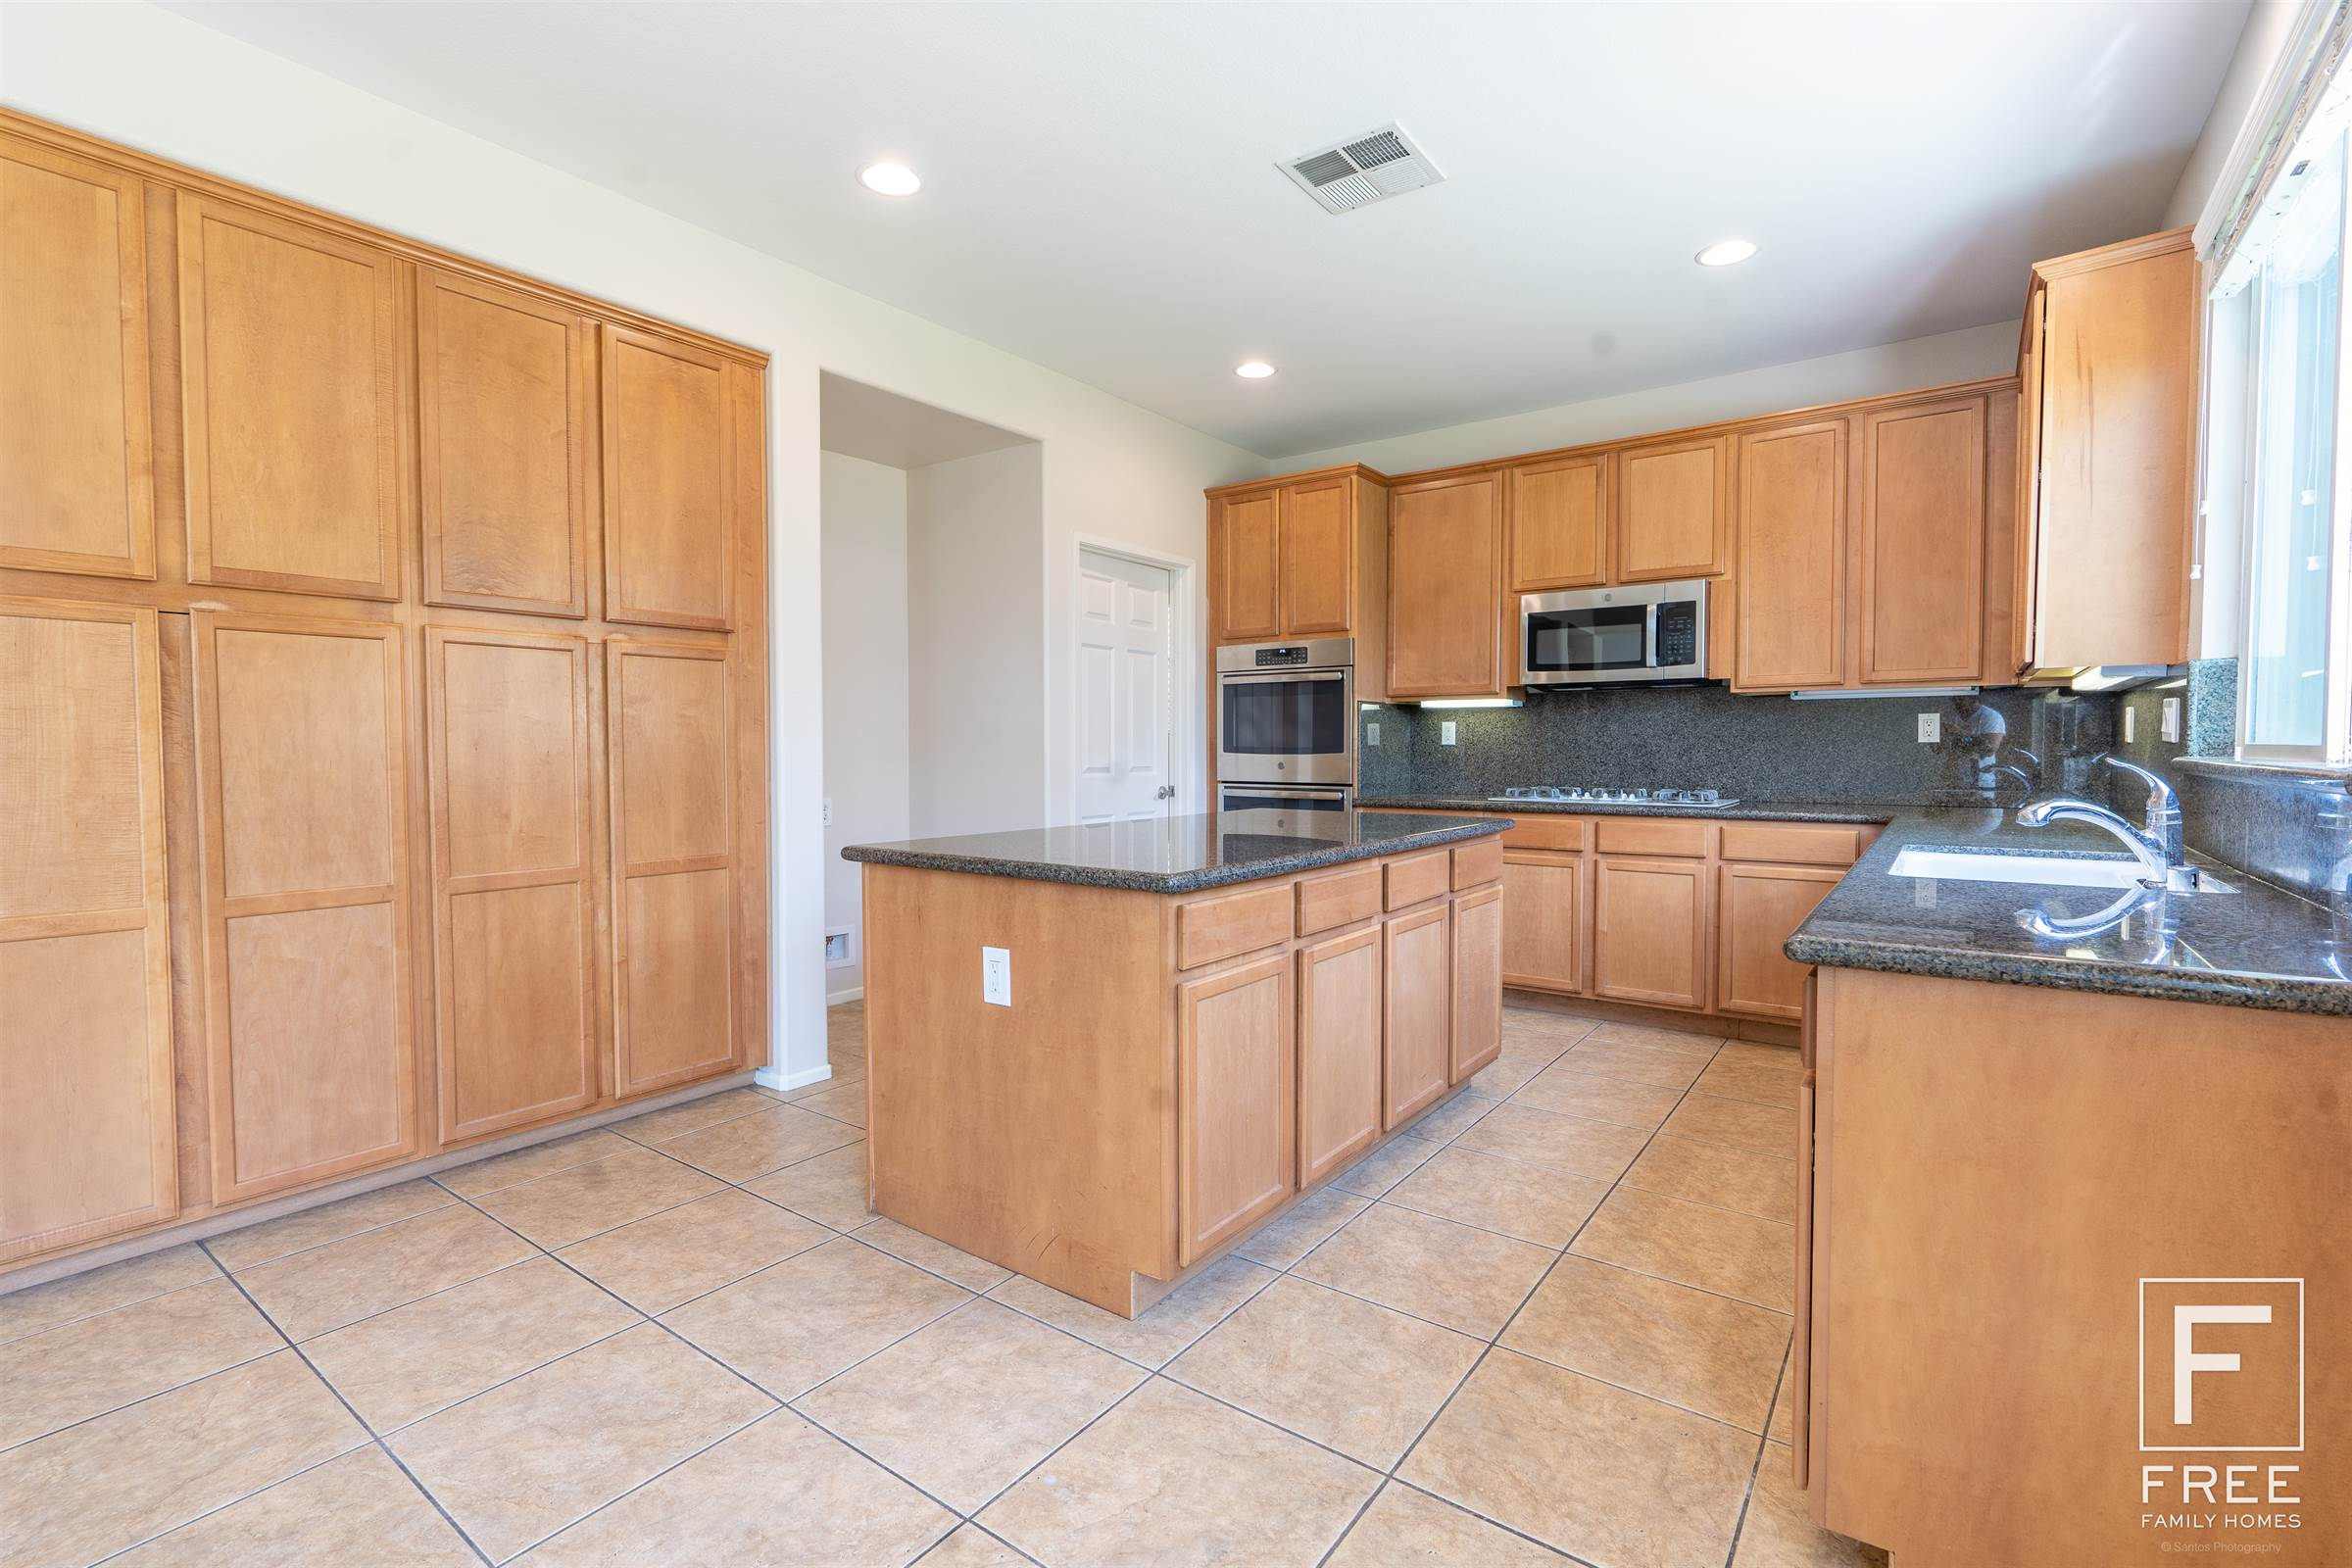 13697 Hunters Run Court, Eastvale, CA 92880